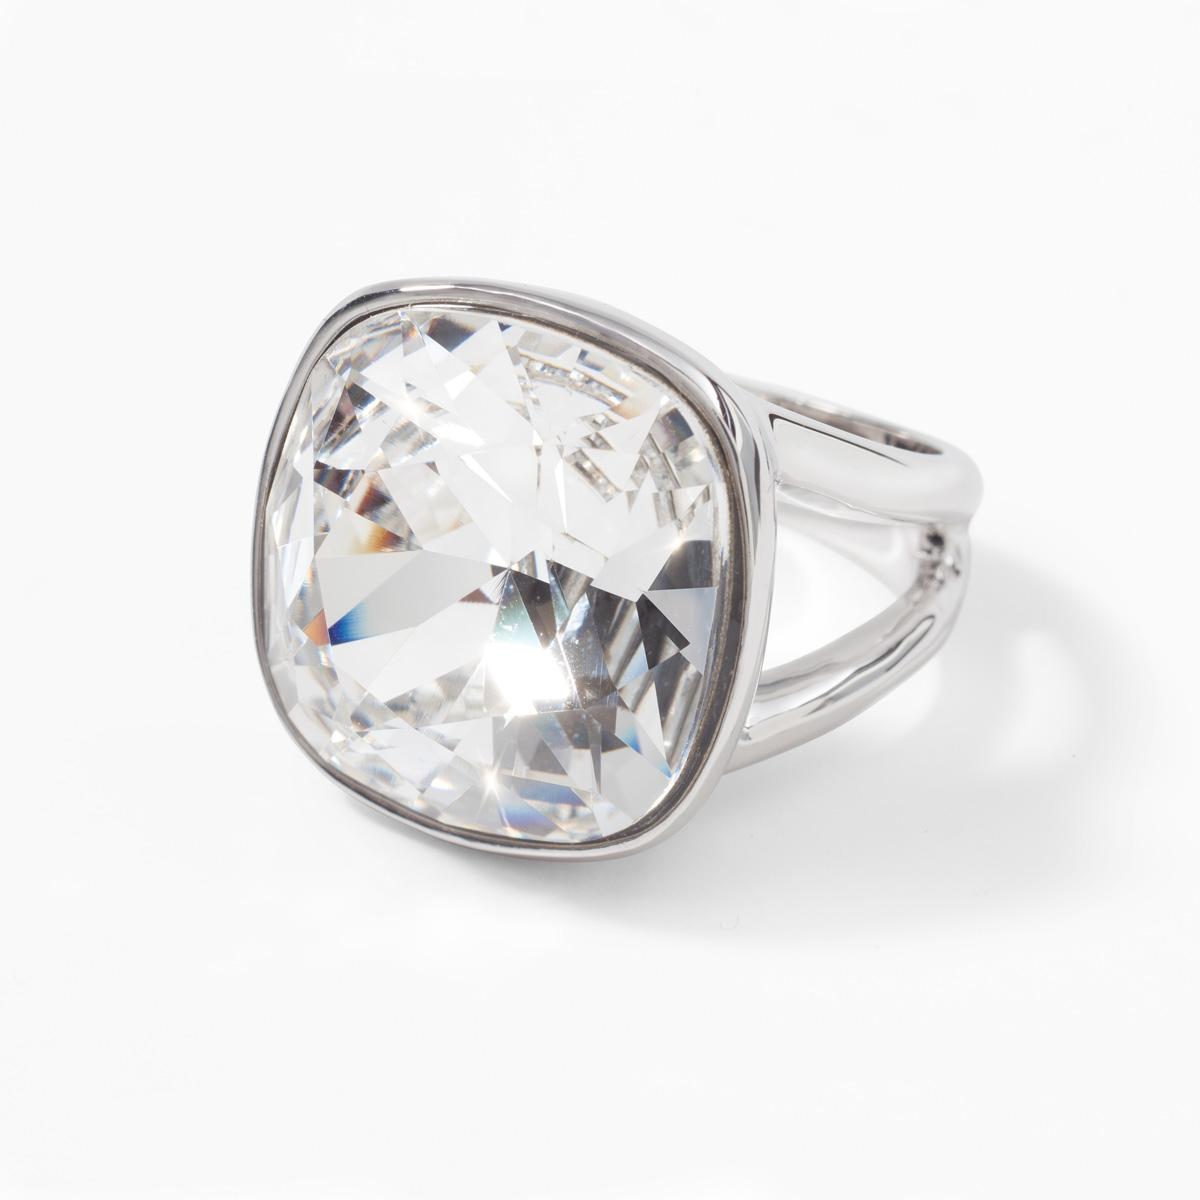 Touchstone Crystal Jewelry By Swarovski On Pinterest